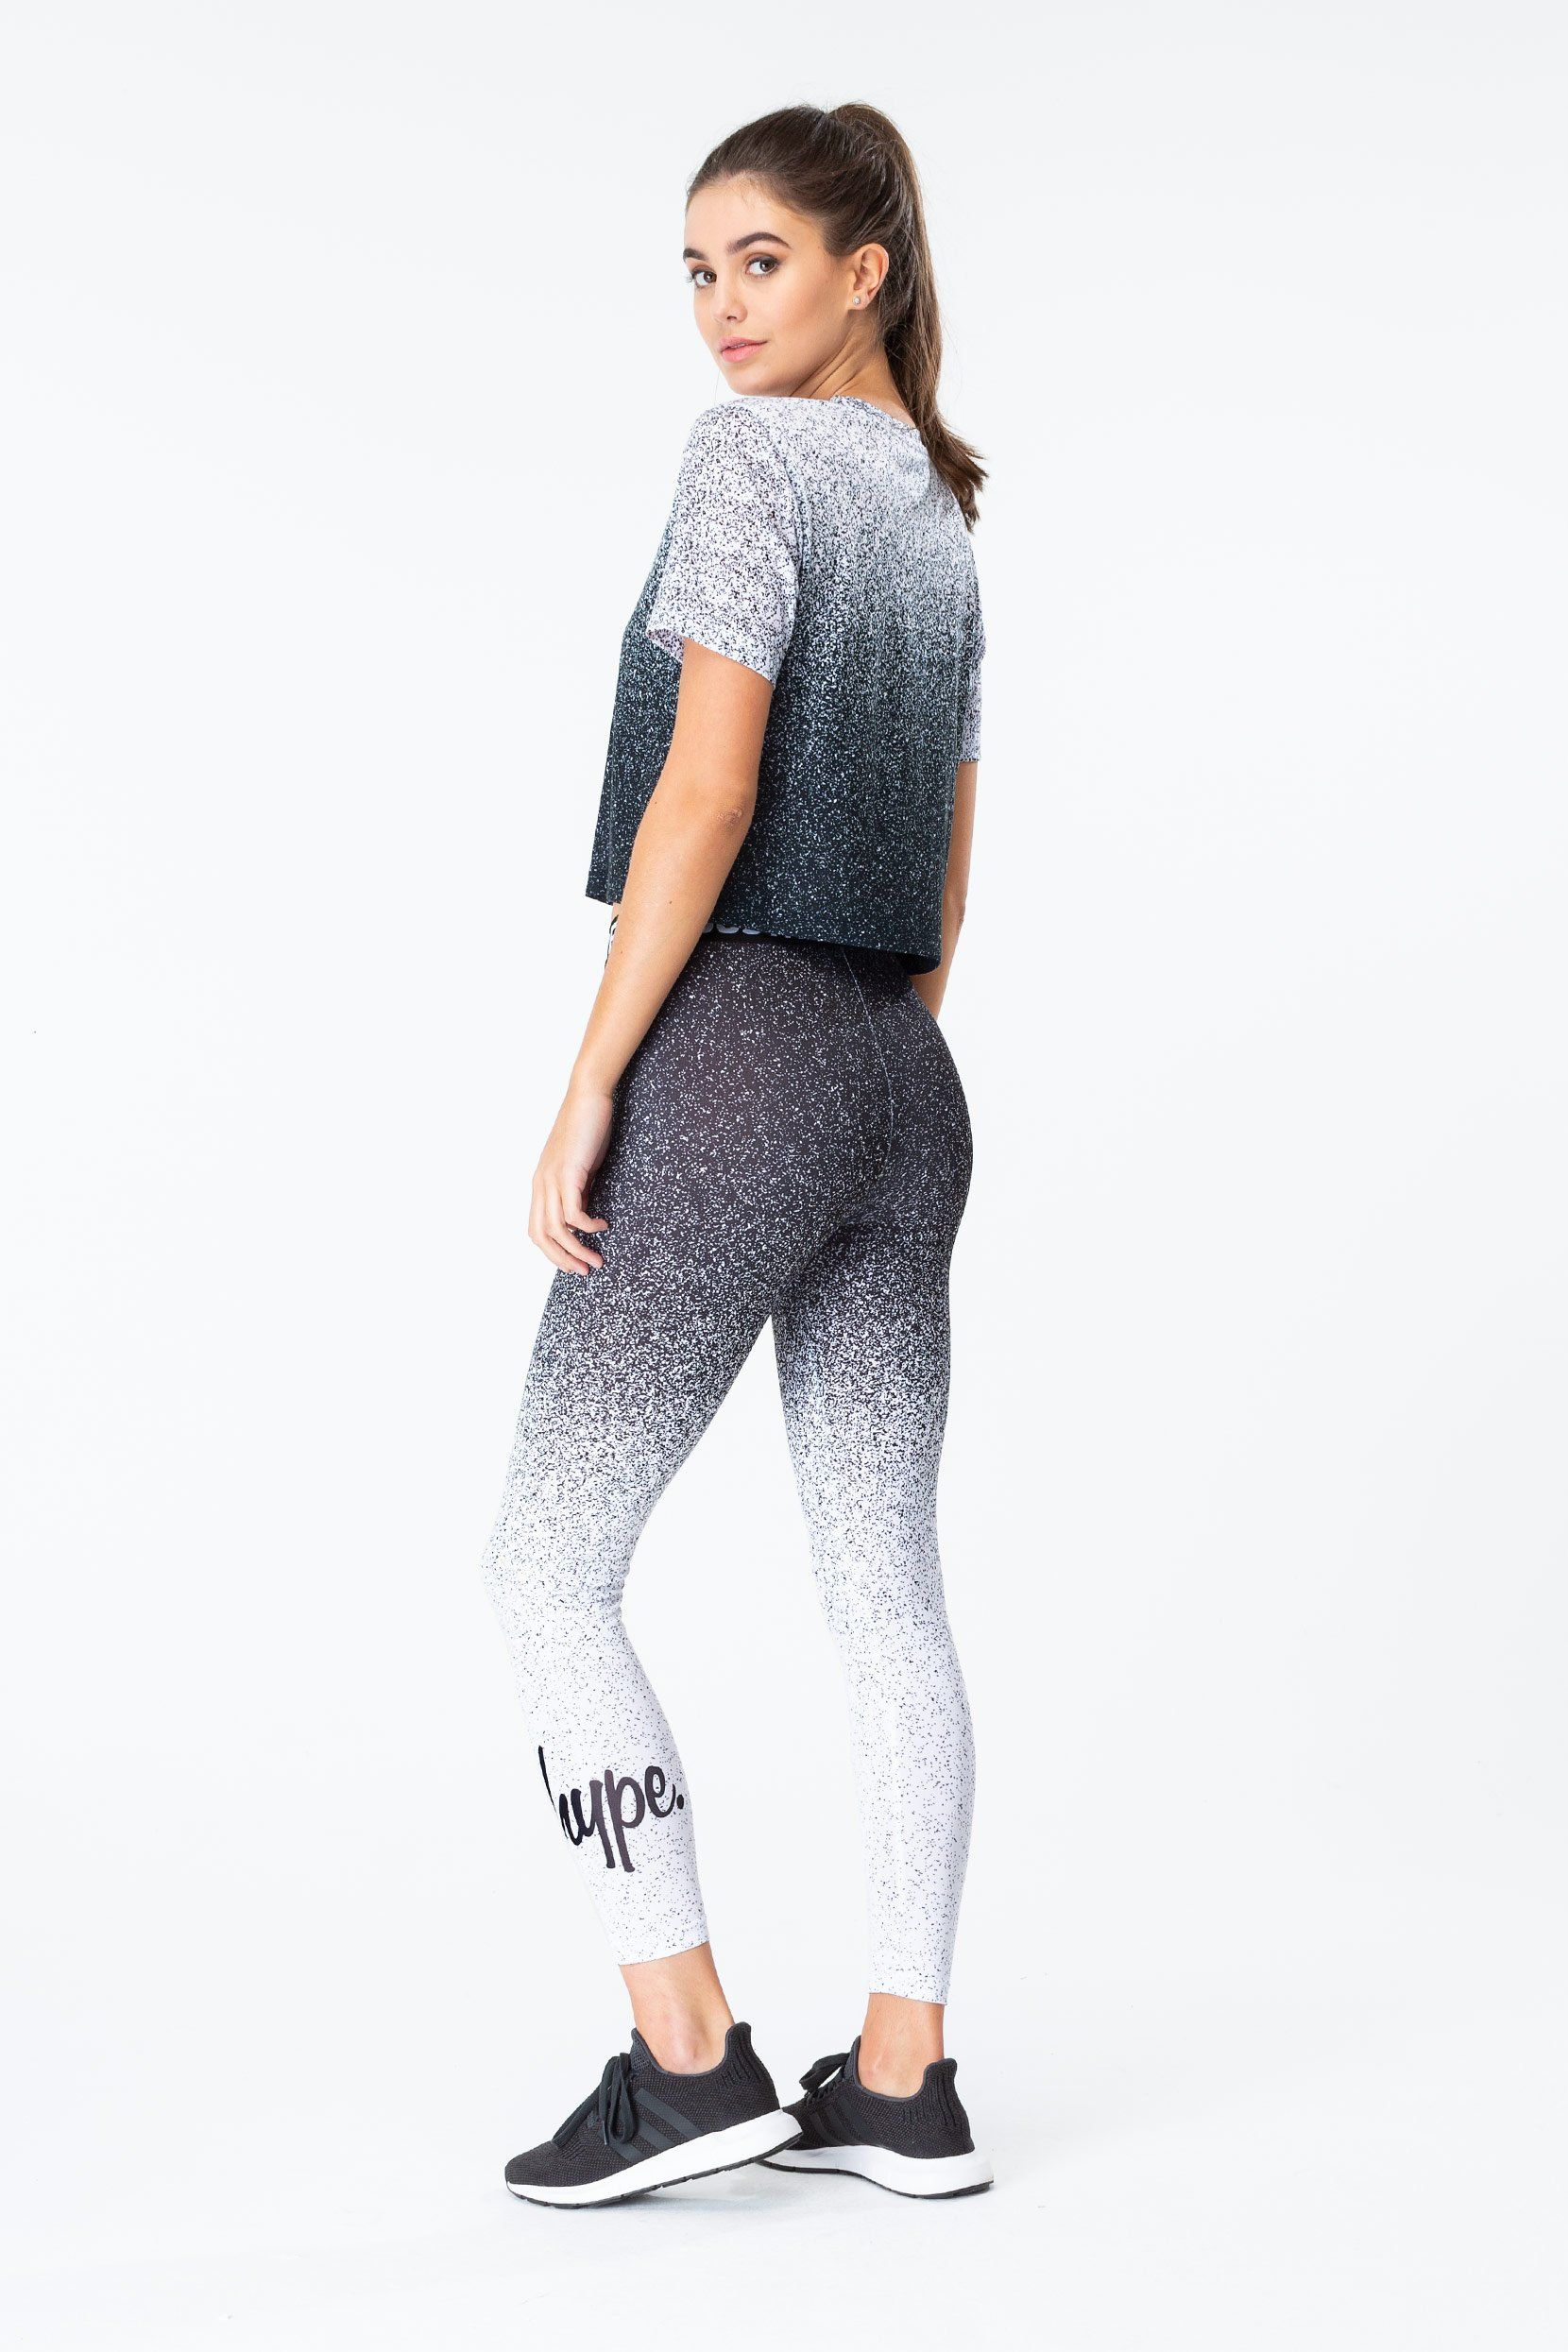 Hype Black Speckle Fade Womens Crop T-Shirt